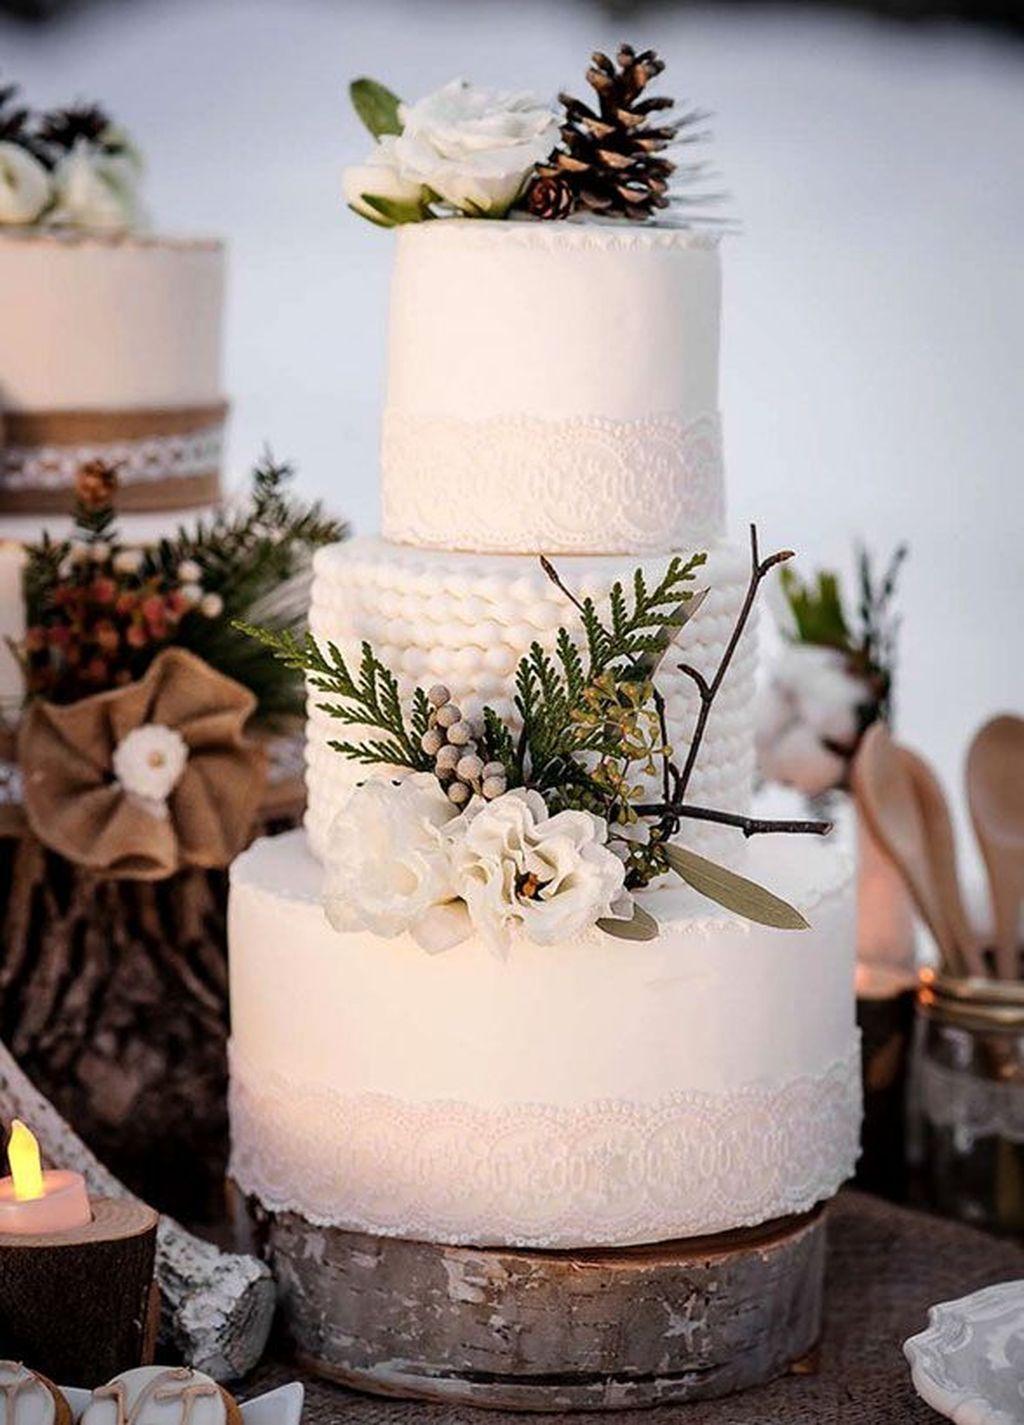 41 Popular Wonderland Wedding Cake Ideas For Winter (avec